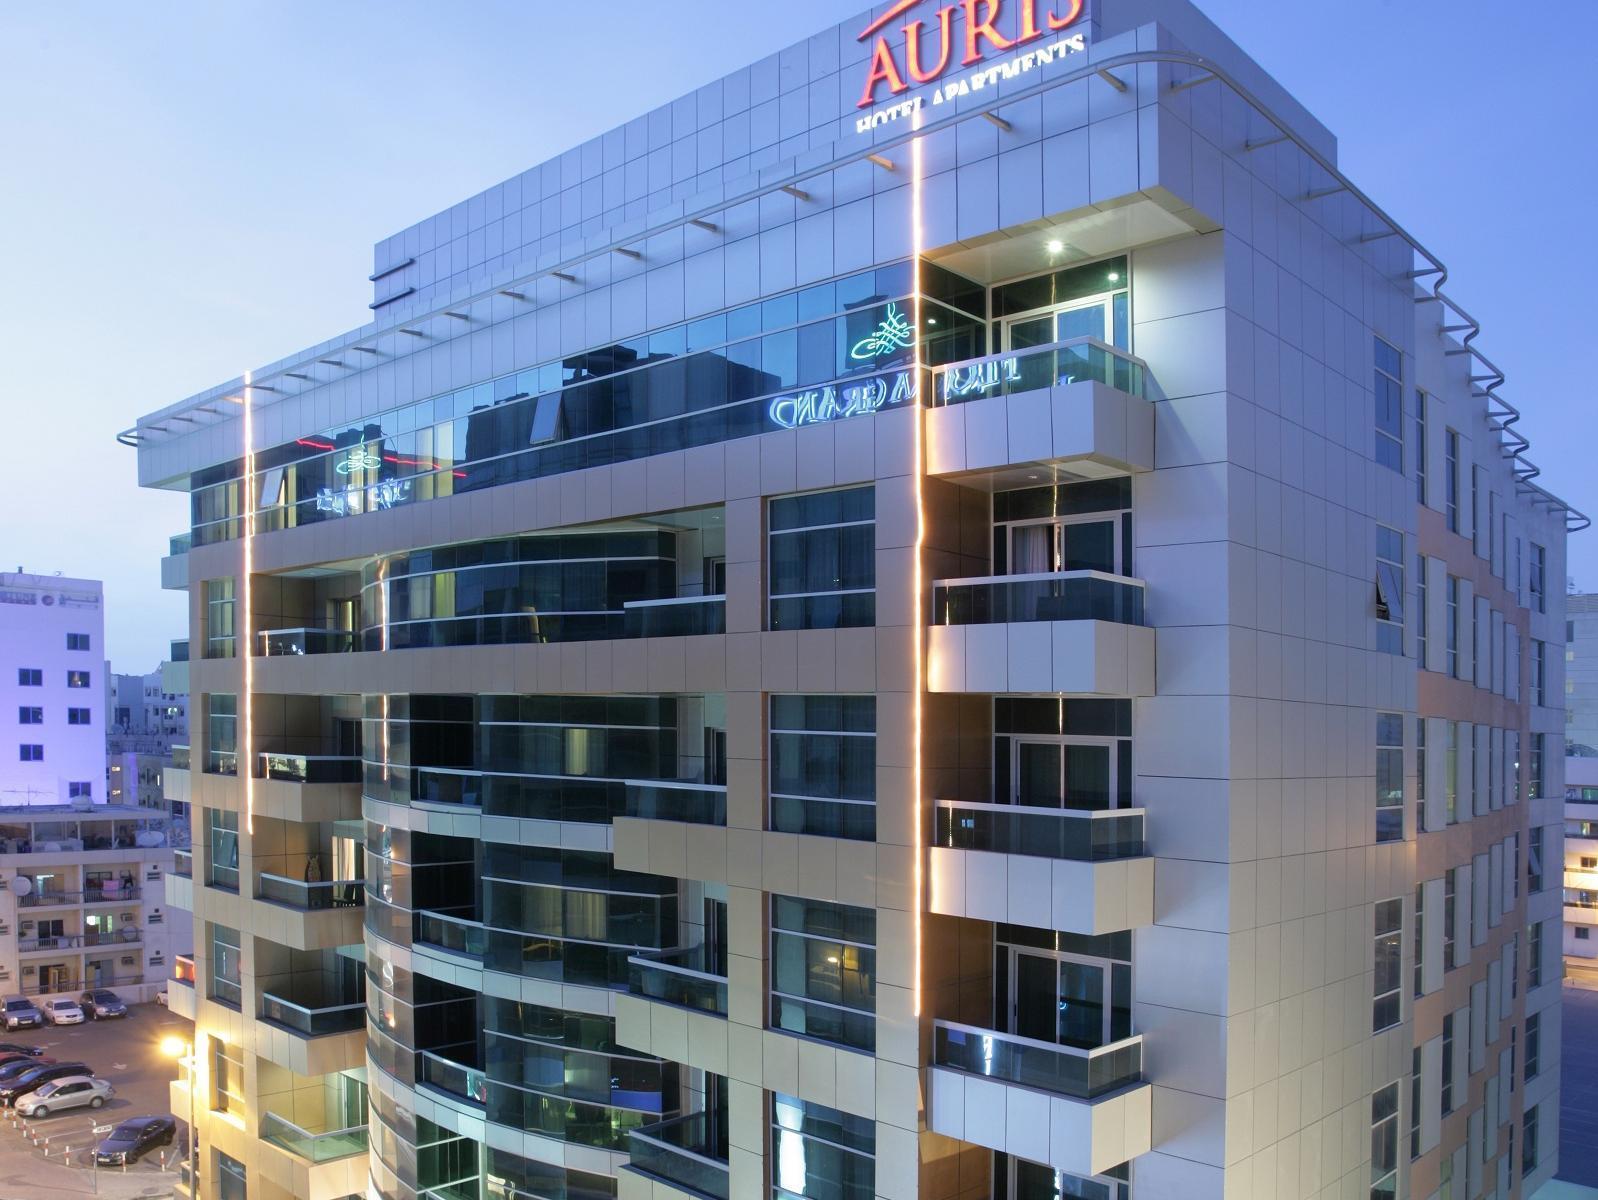 Best Price On Auris Hotel Apartments Deira In Dubai Reviews